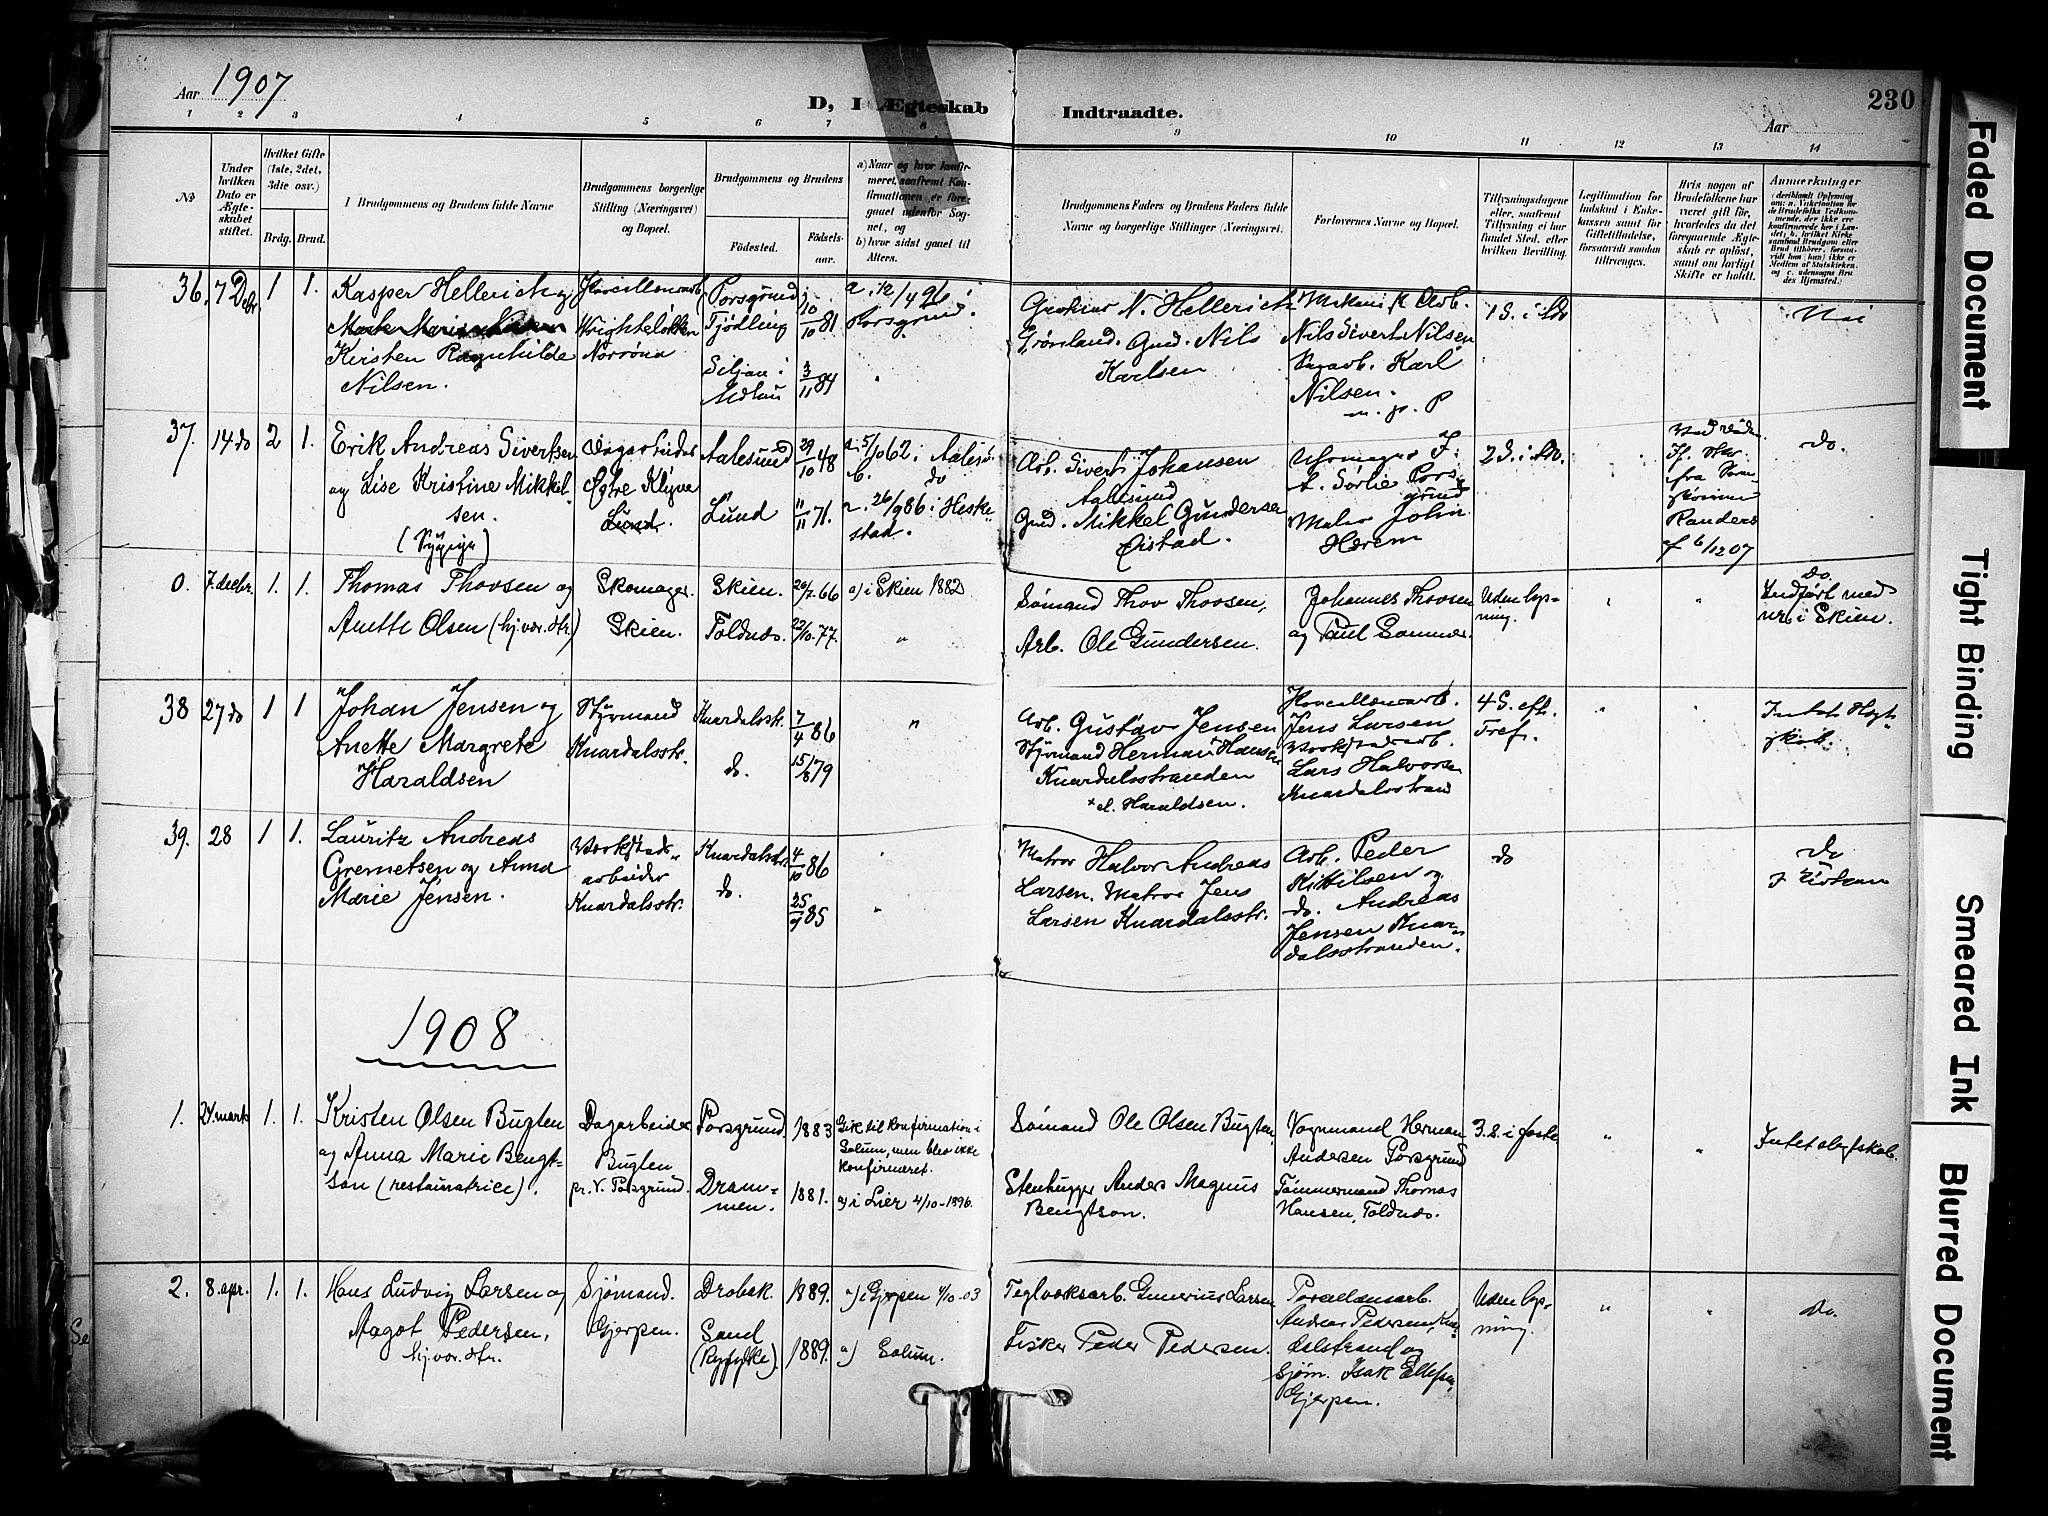 SAKO, Solum kirkebøker, F/Fa/L0011: Ministerialbok nr. I 11, 1898-1909, s. 230